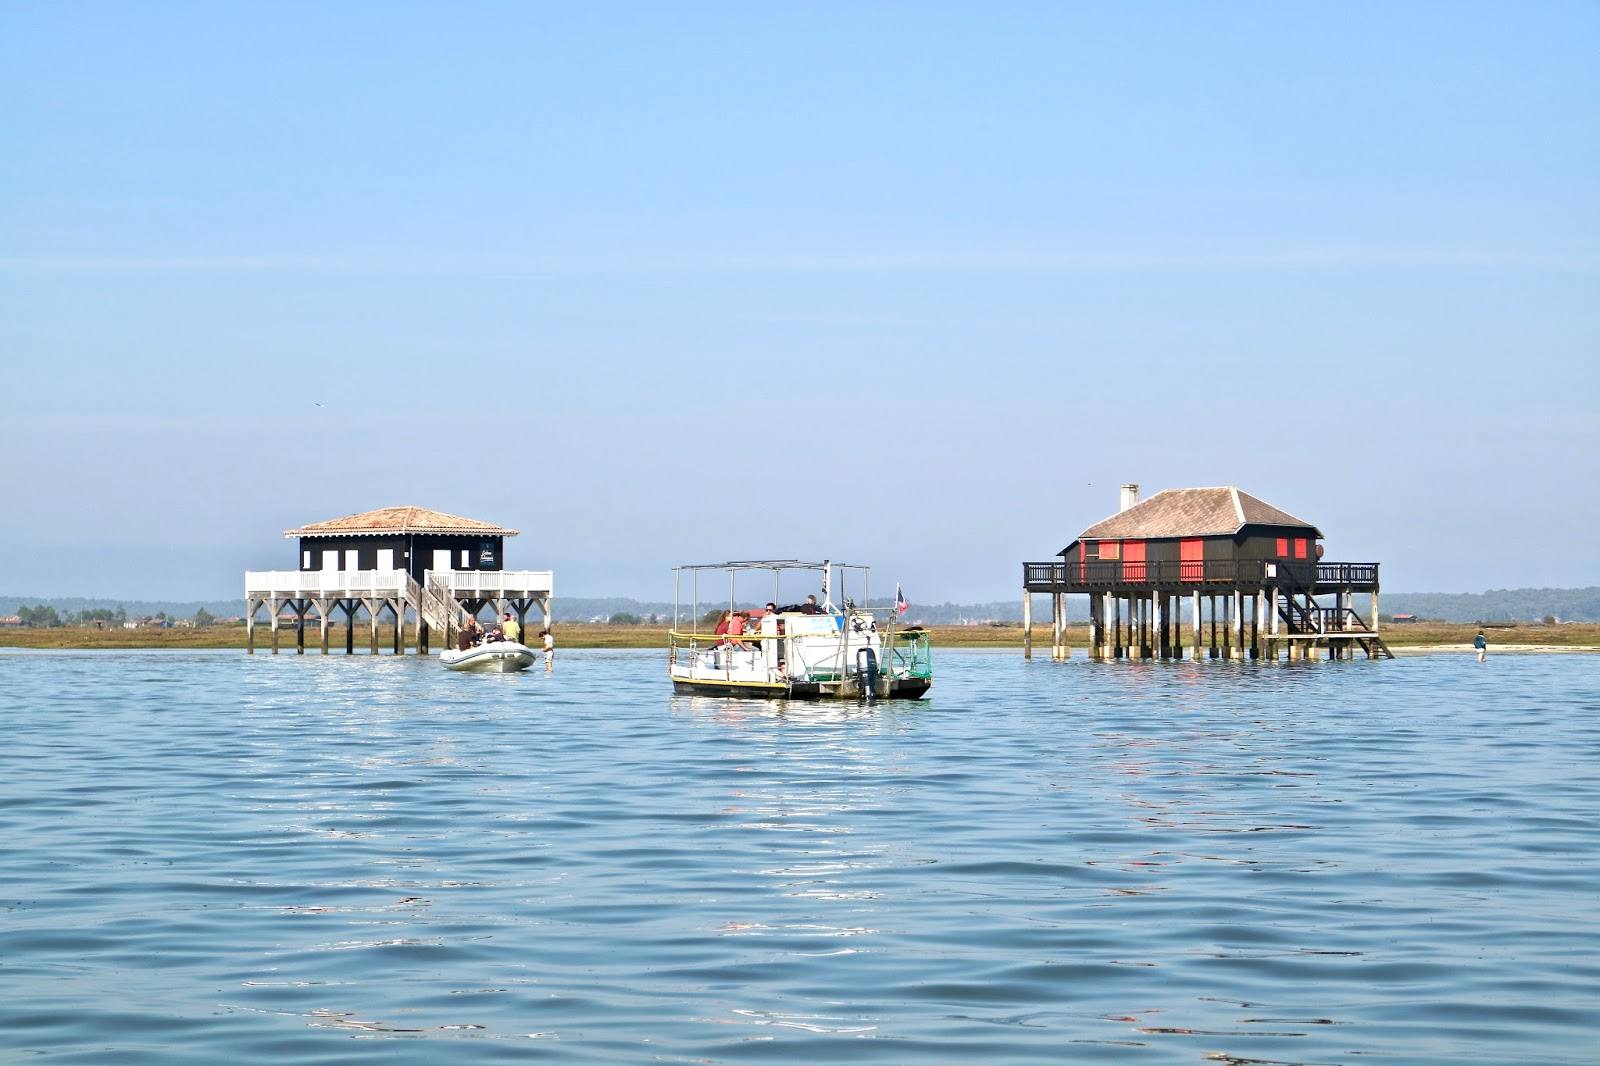 Arcahon Boat Trip